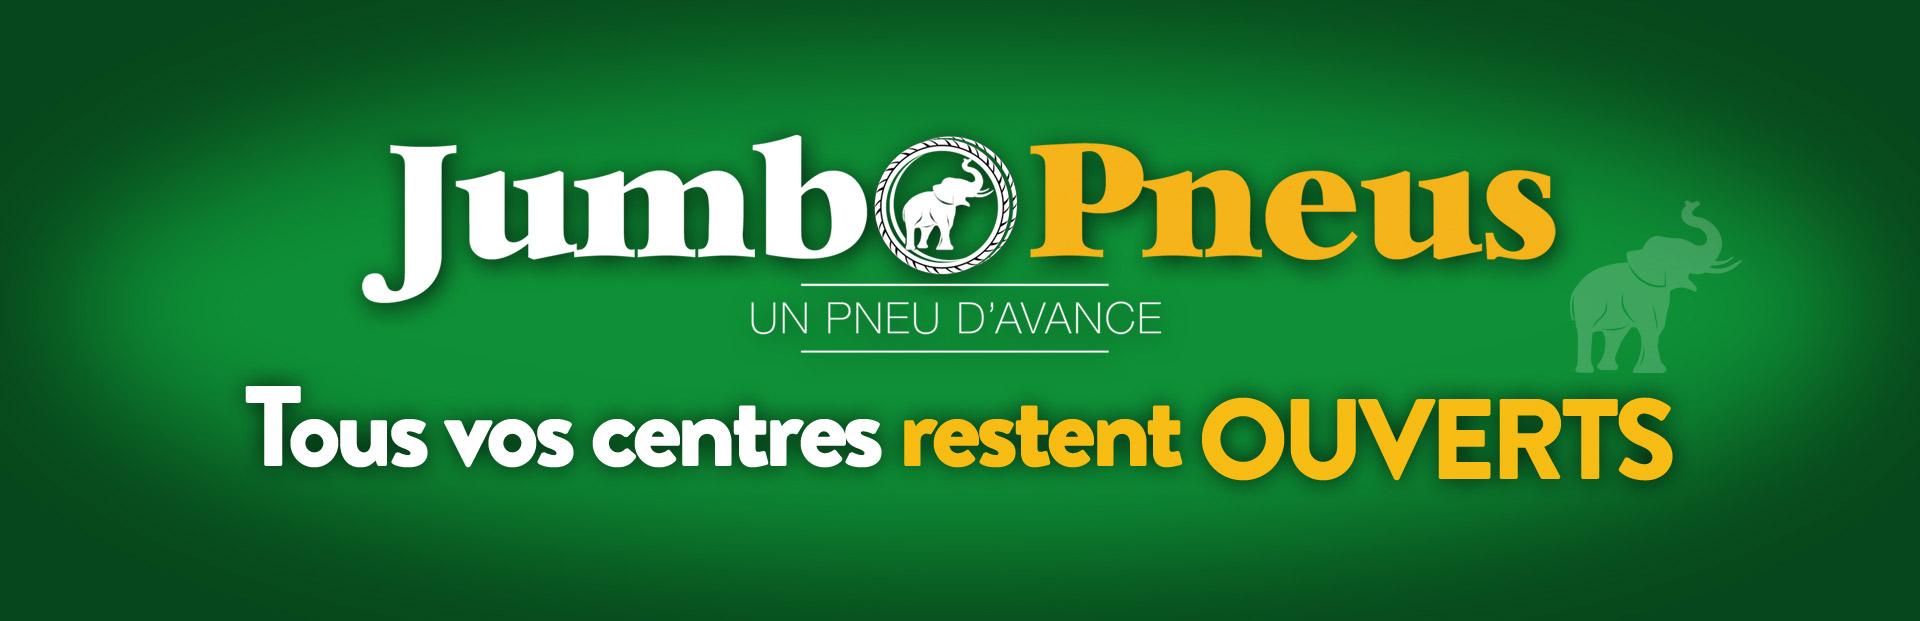 Informations COVID 19 - Novembre 2020 - LES CENTRES JUMBO PNEUS RESTENT OUVERTS!